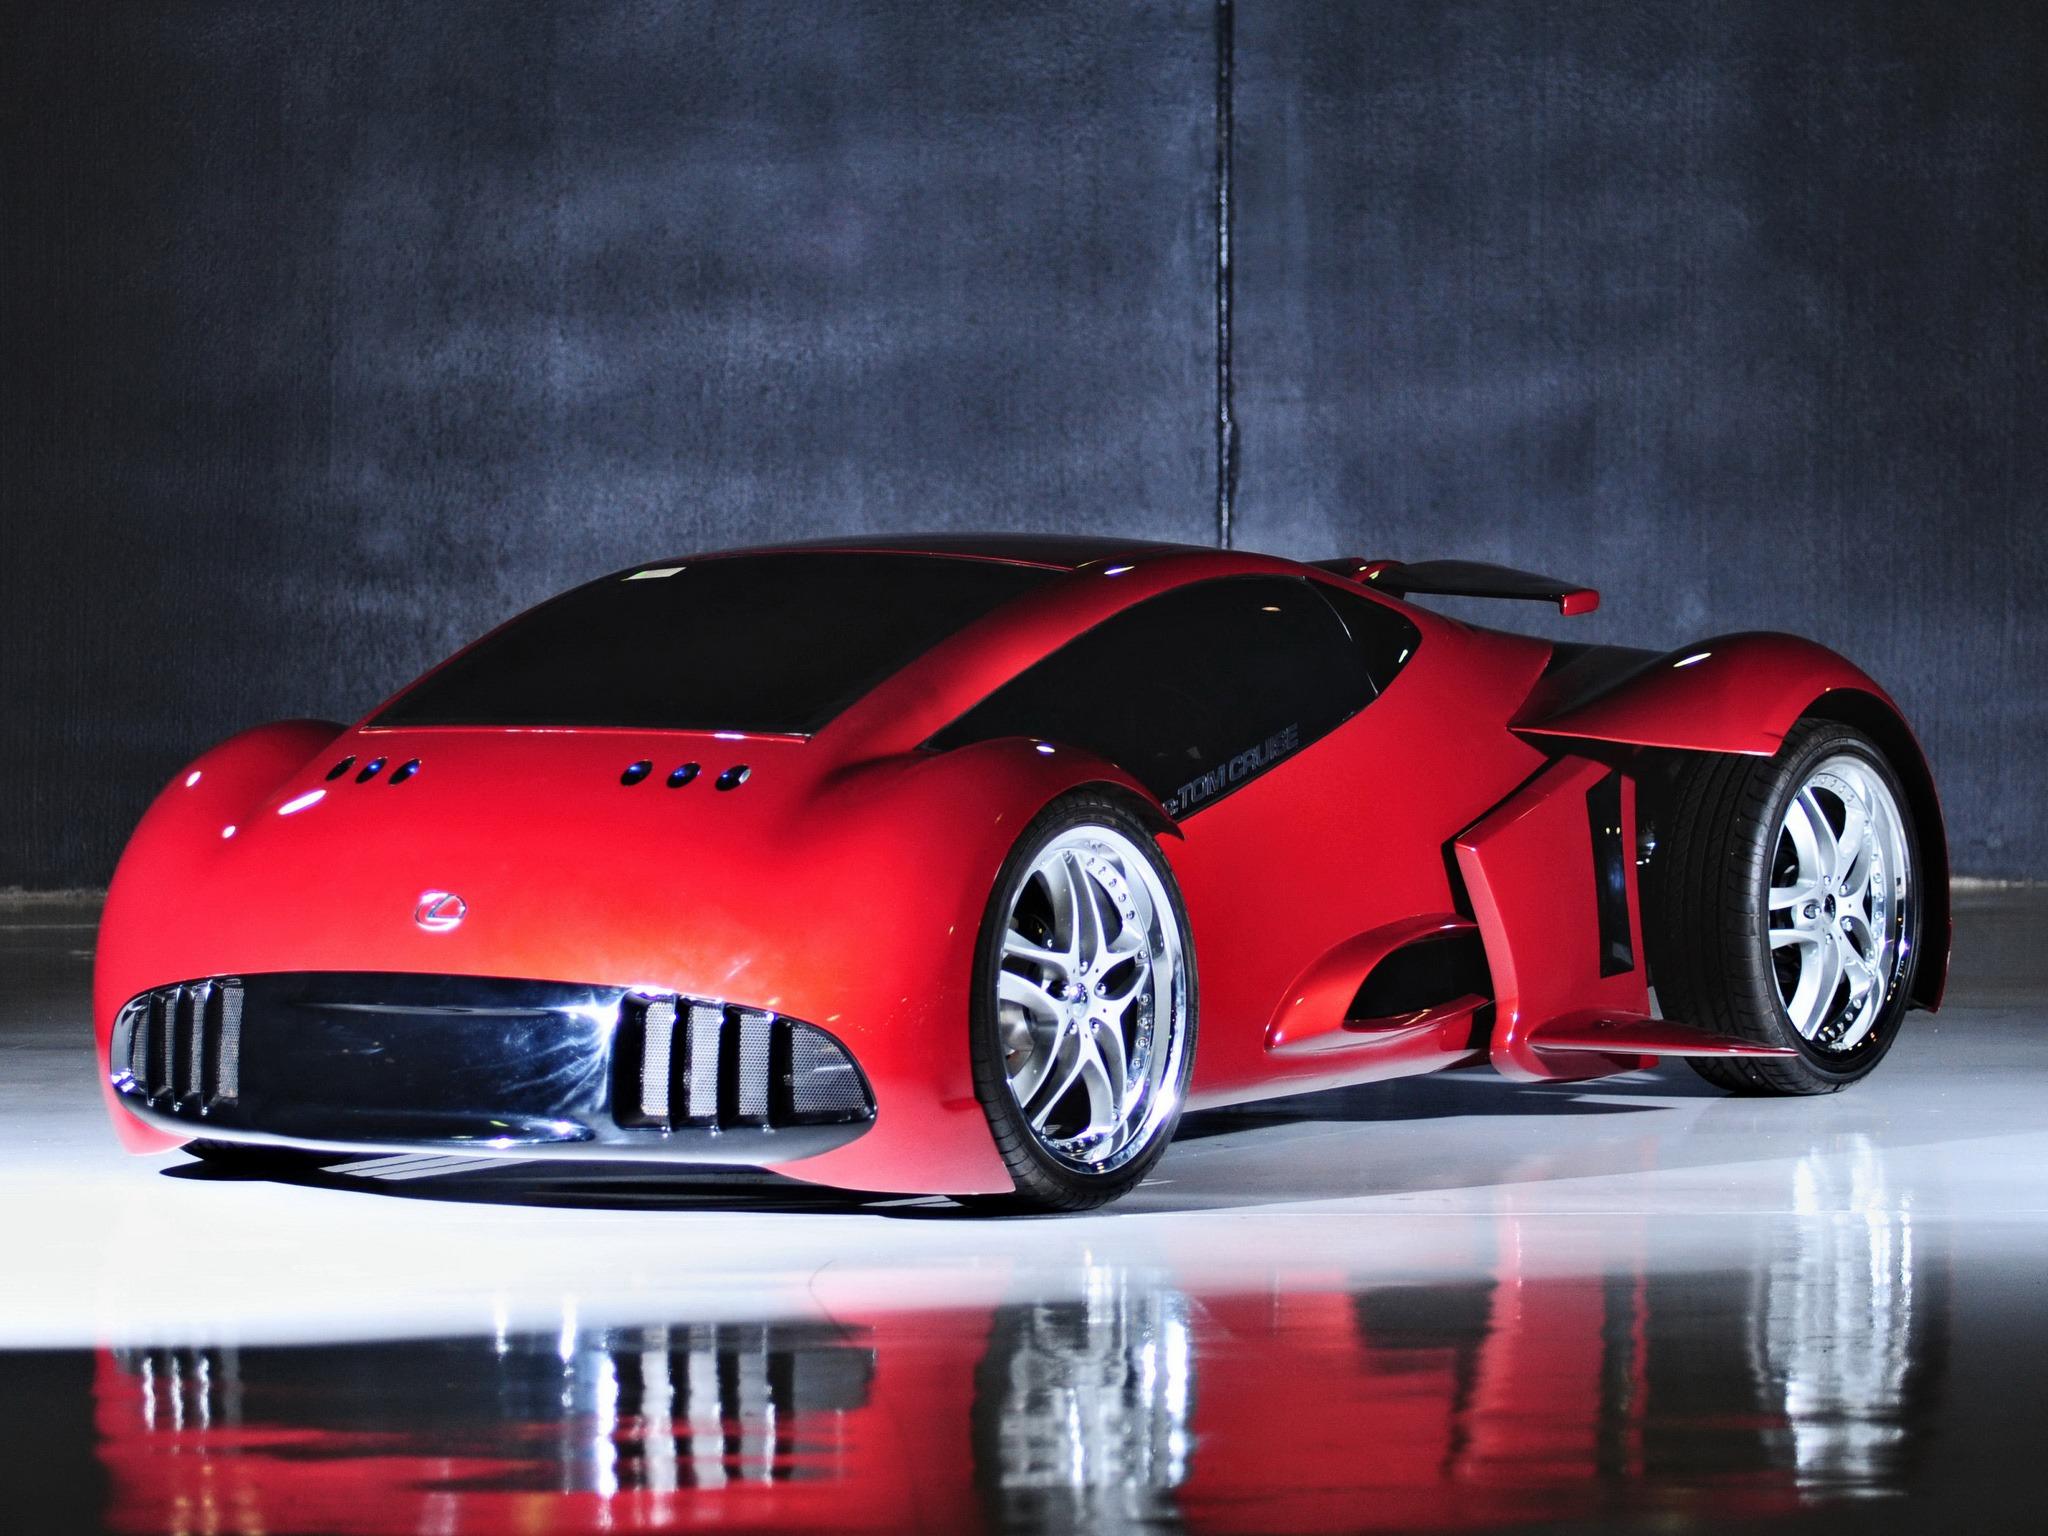 Lexus 2054 Minority Report Concept (2002) – Old Concept Cars